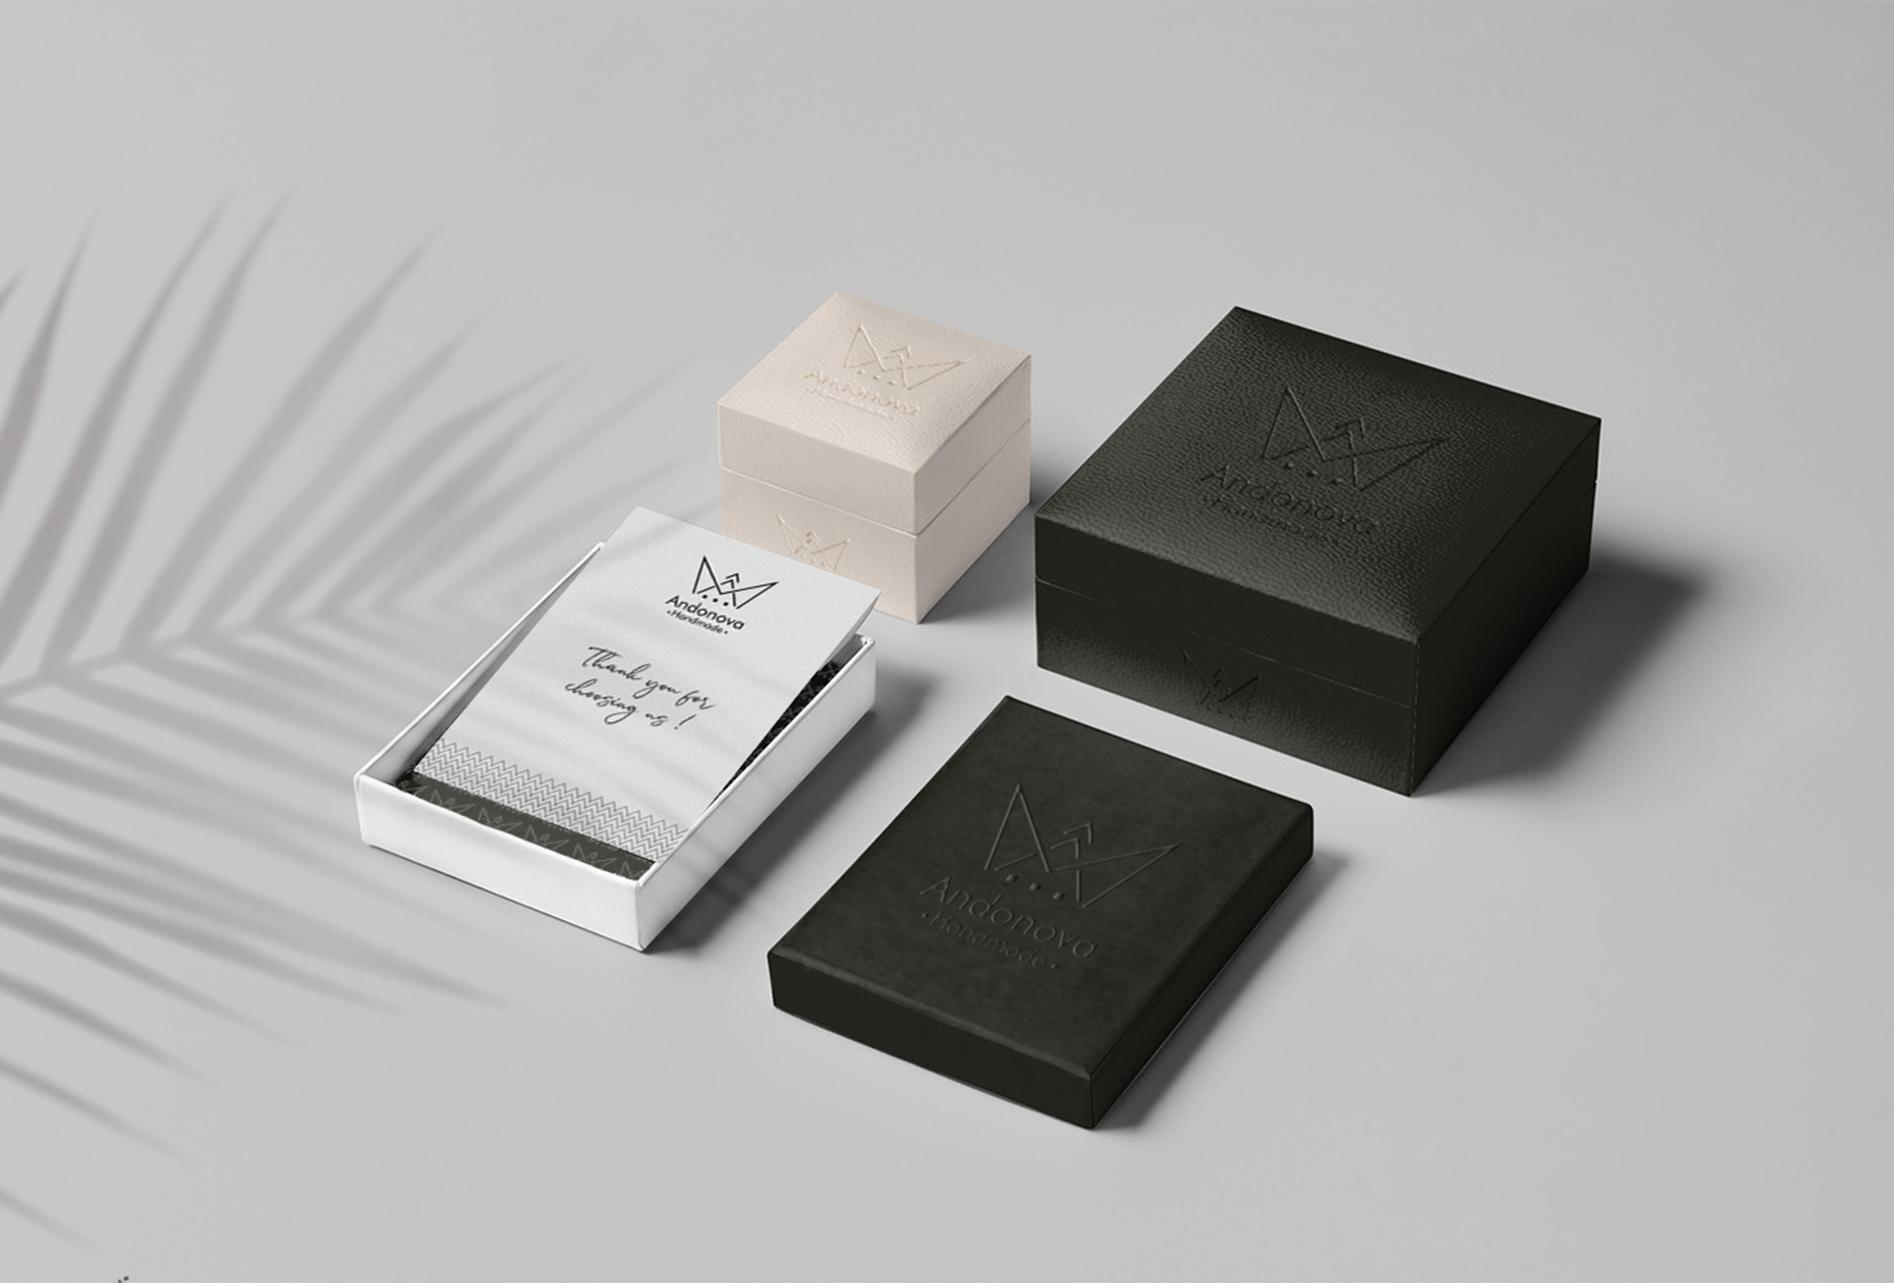 Branding for Andonova hand made jewelry